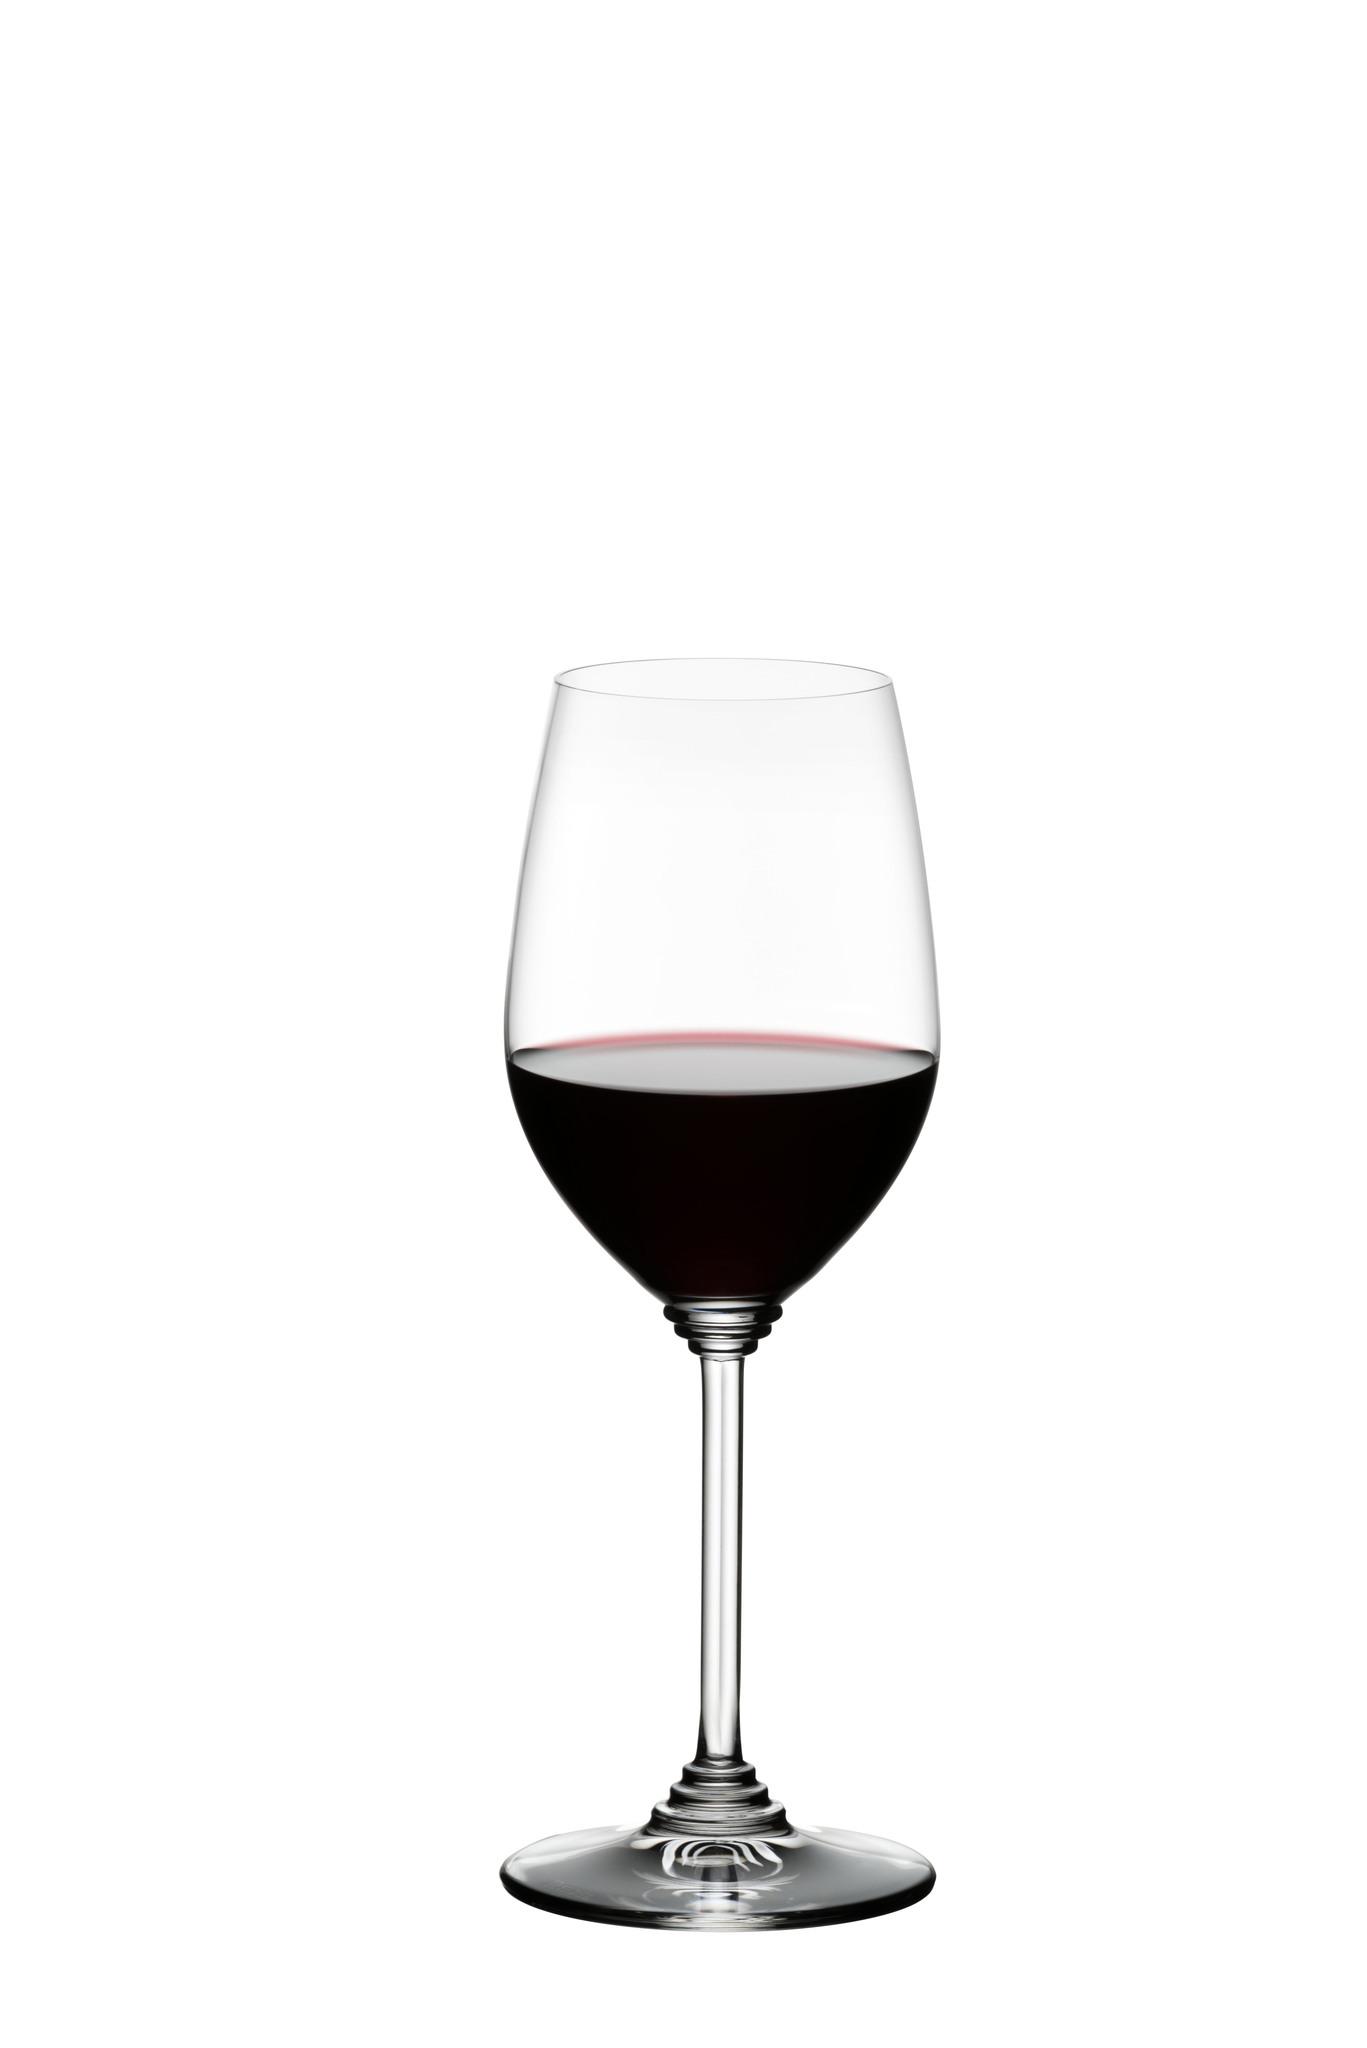 Бокалы Набор бокалов для красного вина 2шт 380мл Riedel Wine Zinfandel nabor-bokalov-dlya-krasnogo-vina-2-sht-380-ml-riedel-wine-zinfandel-avstriya.jpg